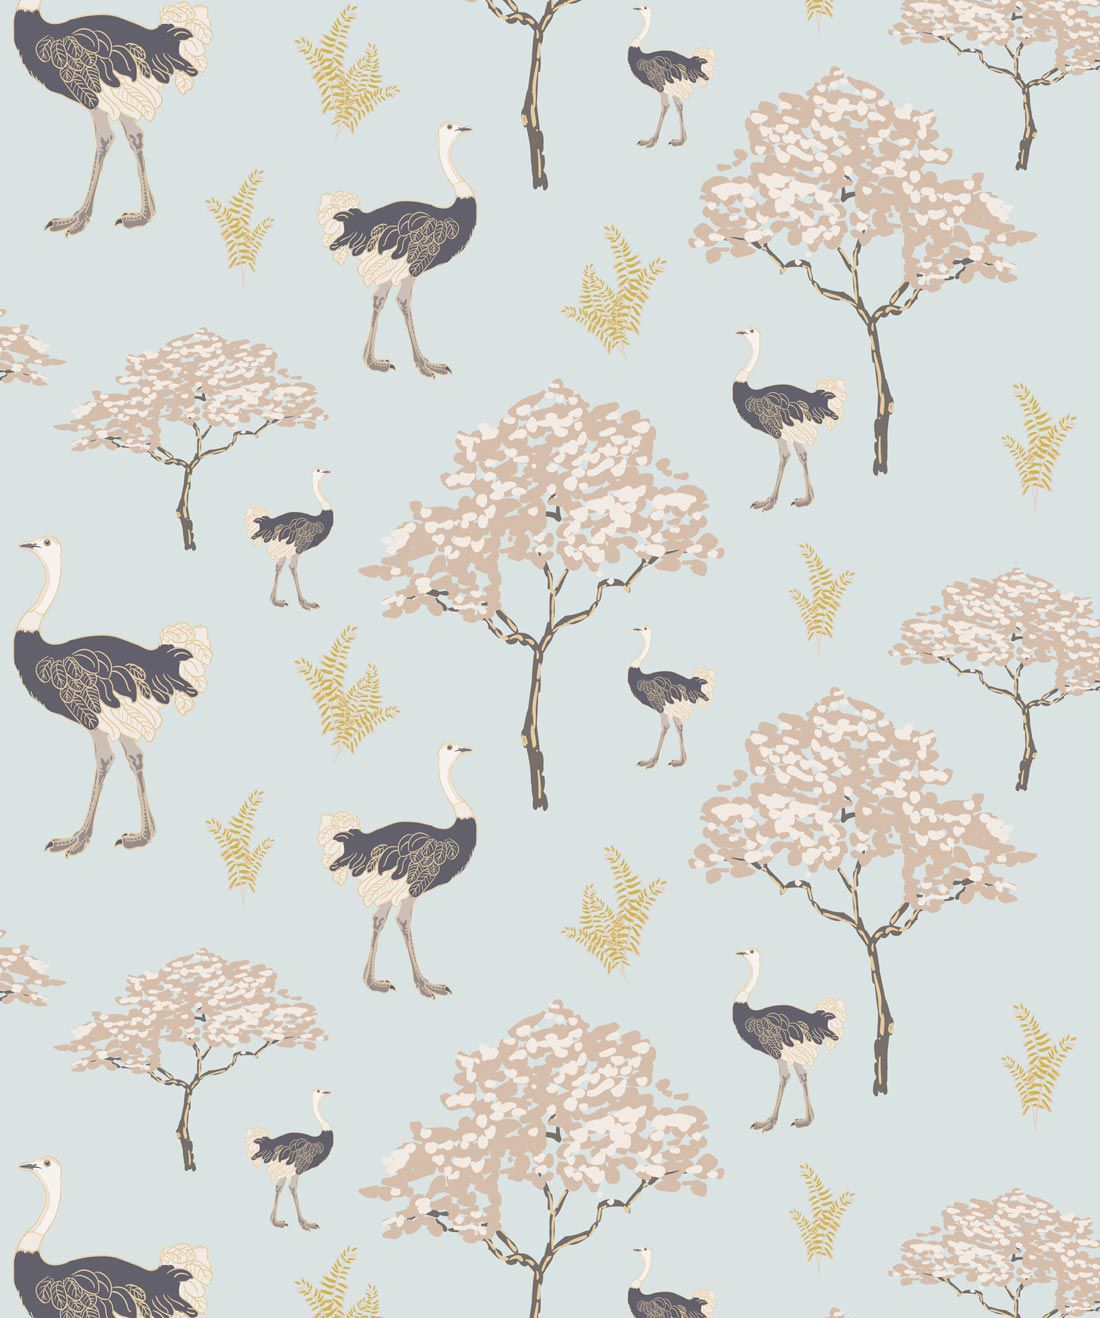 Savannah Ostrich Wallpaper